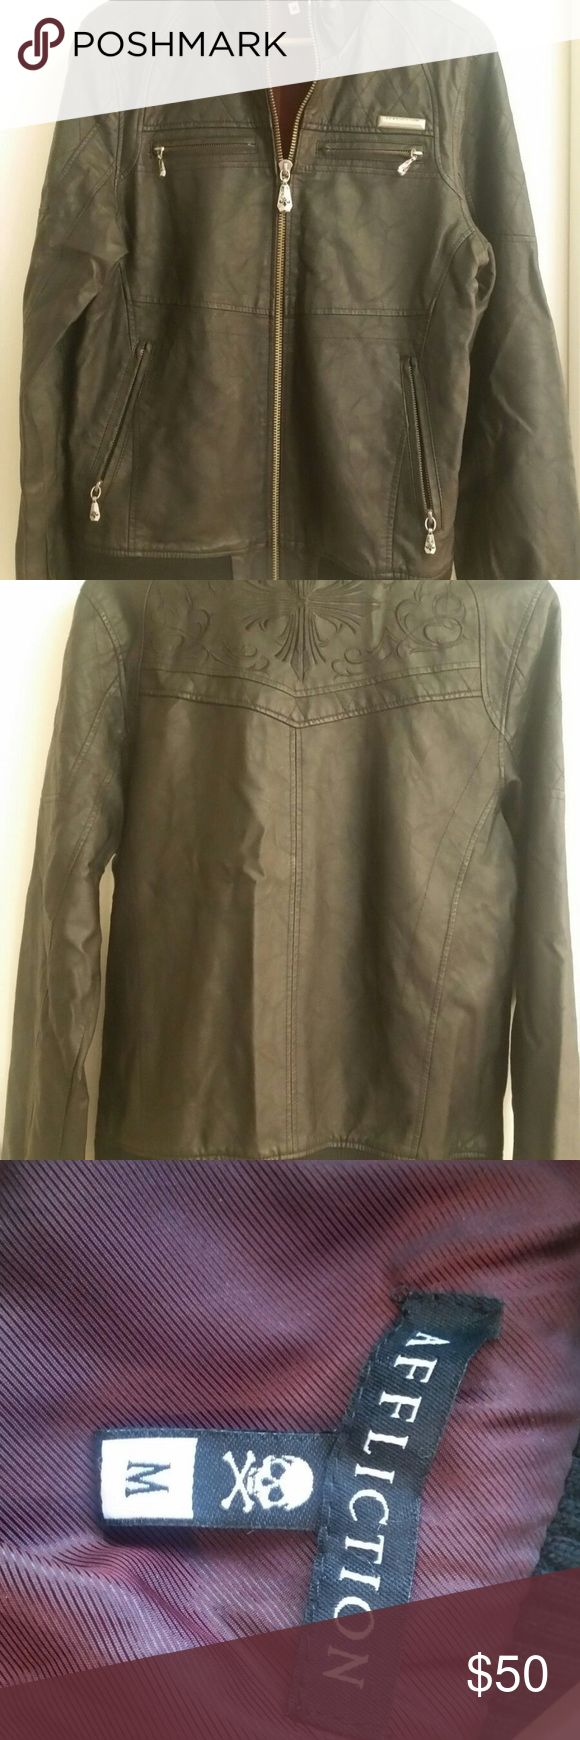 AFFLICTION Medium Jacket Super nice black jacket It's a